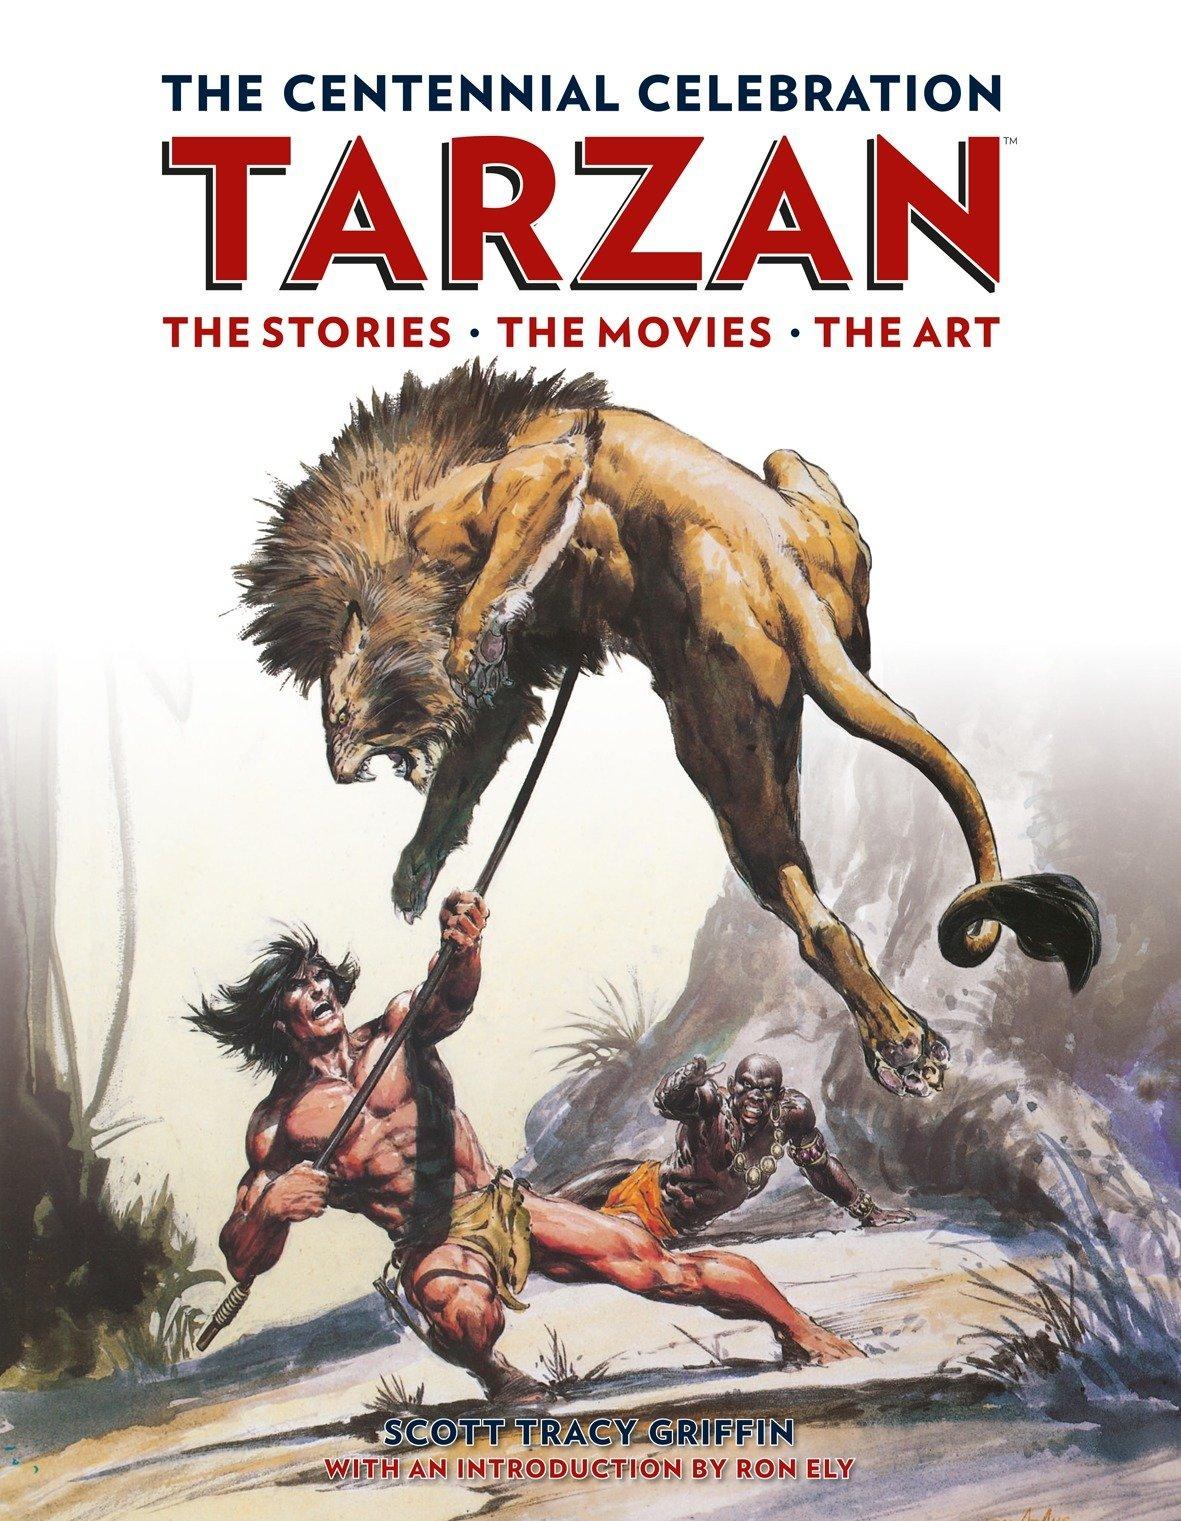 Tarzan  The Centennial Celebration  The Stores The Movies The Art